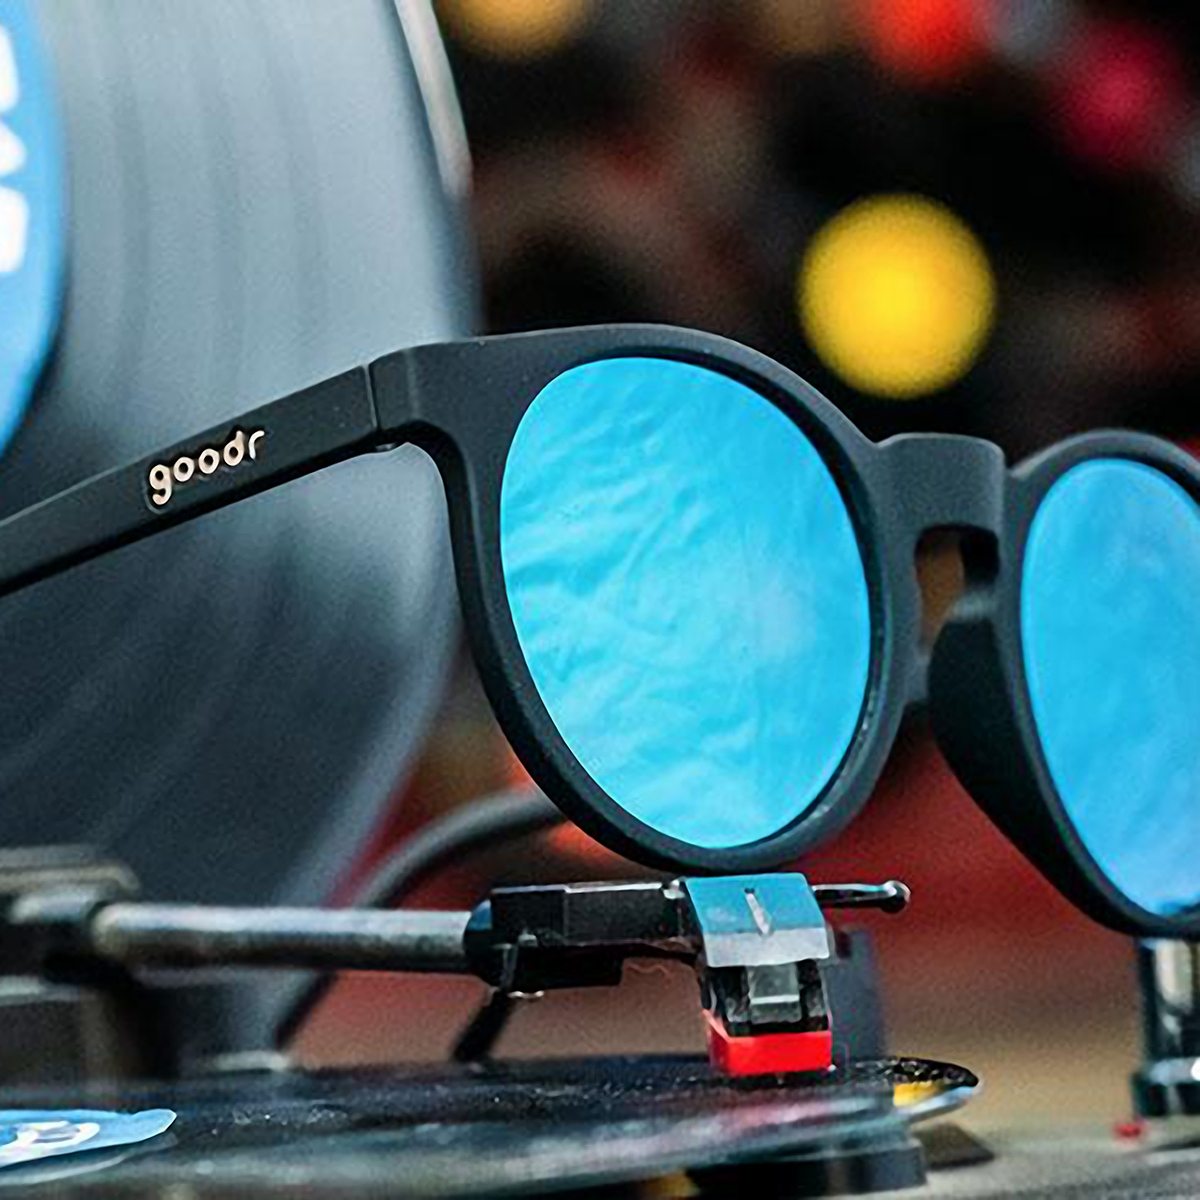 Goodr Midnight Ramble At Circle Bar Sunglasses - Color: Black - Size: OS, Black, large, image 4